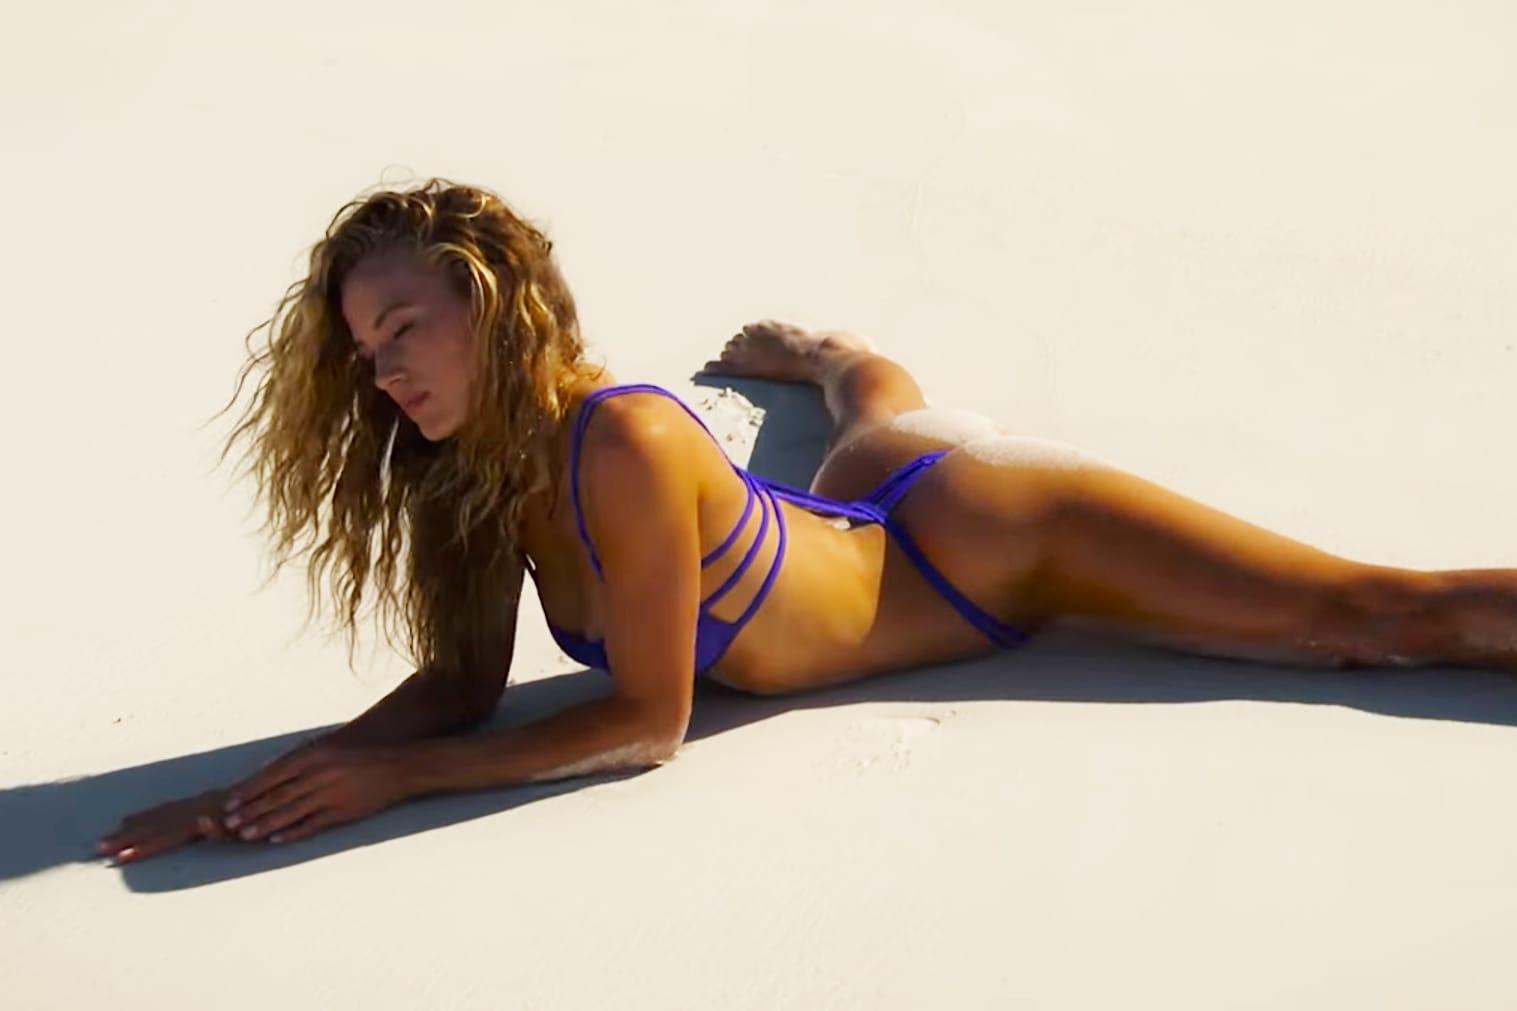 Video Hannah Ferguson nudes (94 foto and video), Tits, Paparazzi, Instagram, butt 2020